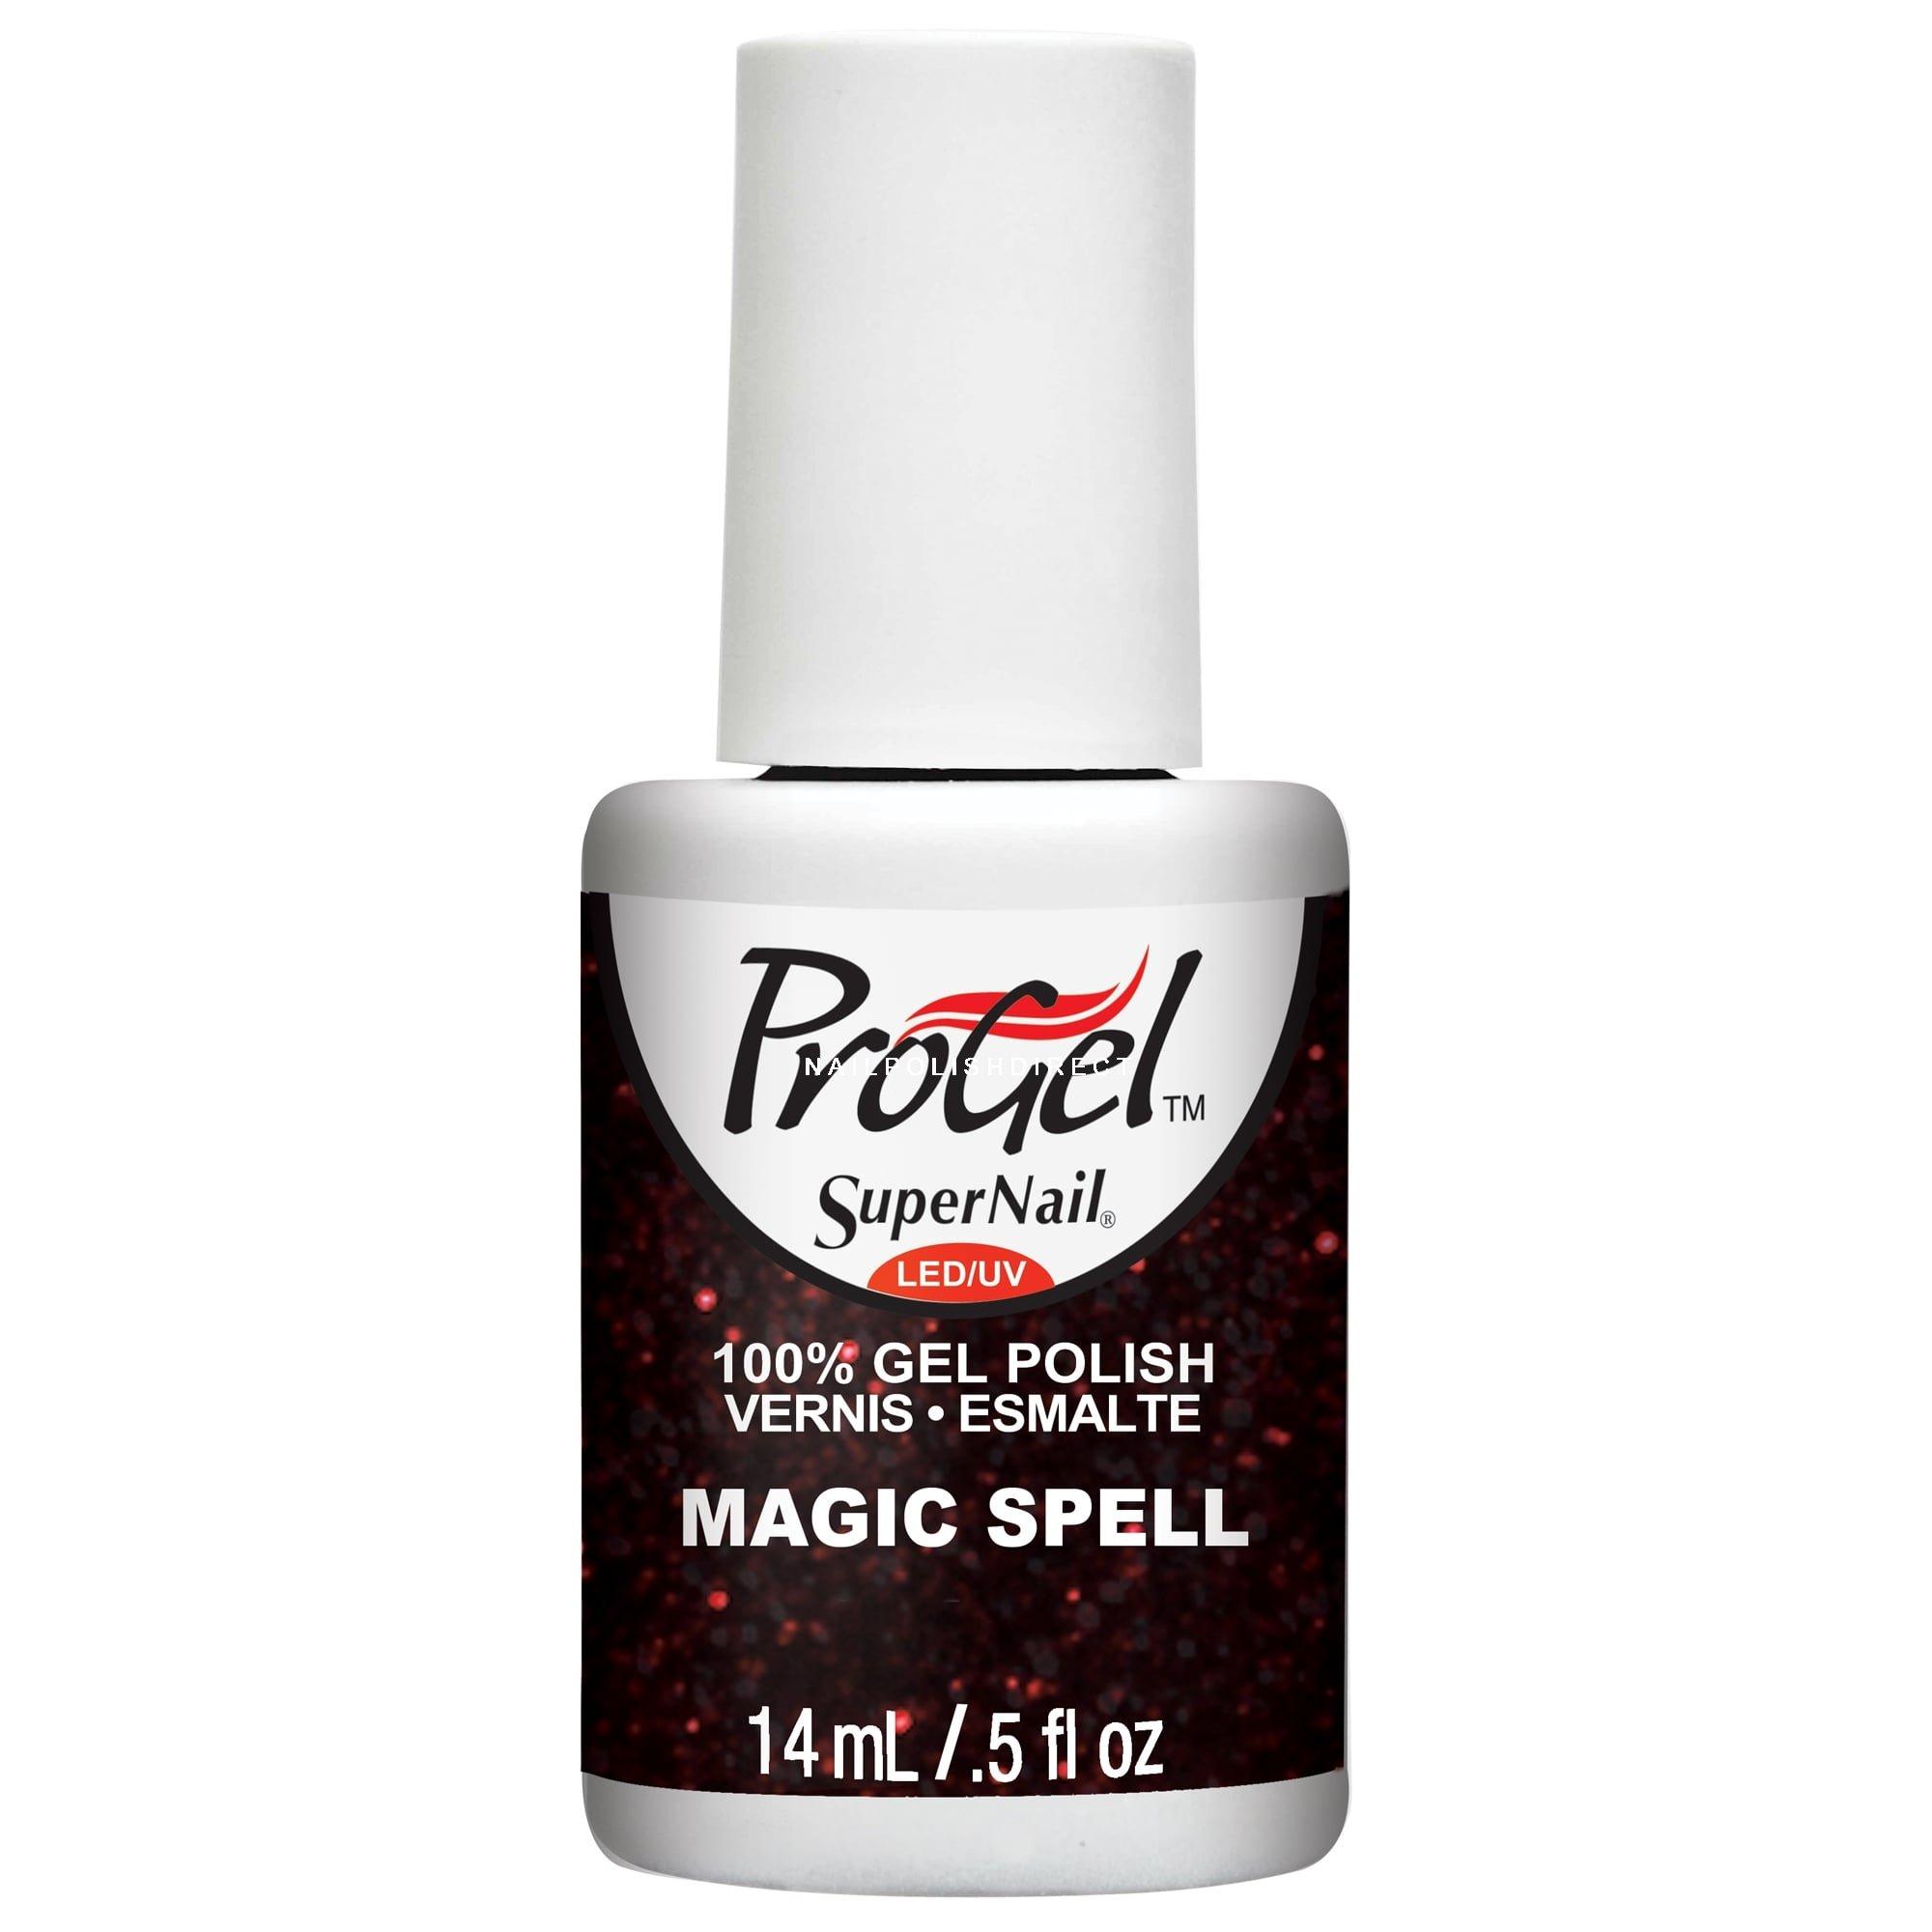 SuperNail ProGel Nail Polish - Magic Spell 14mL | Professional Nails